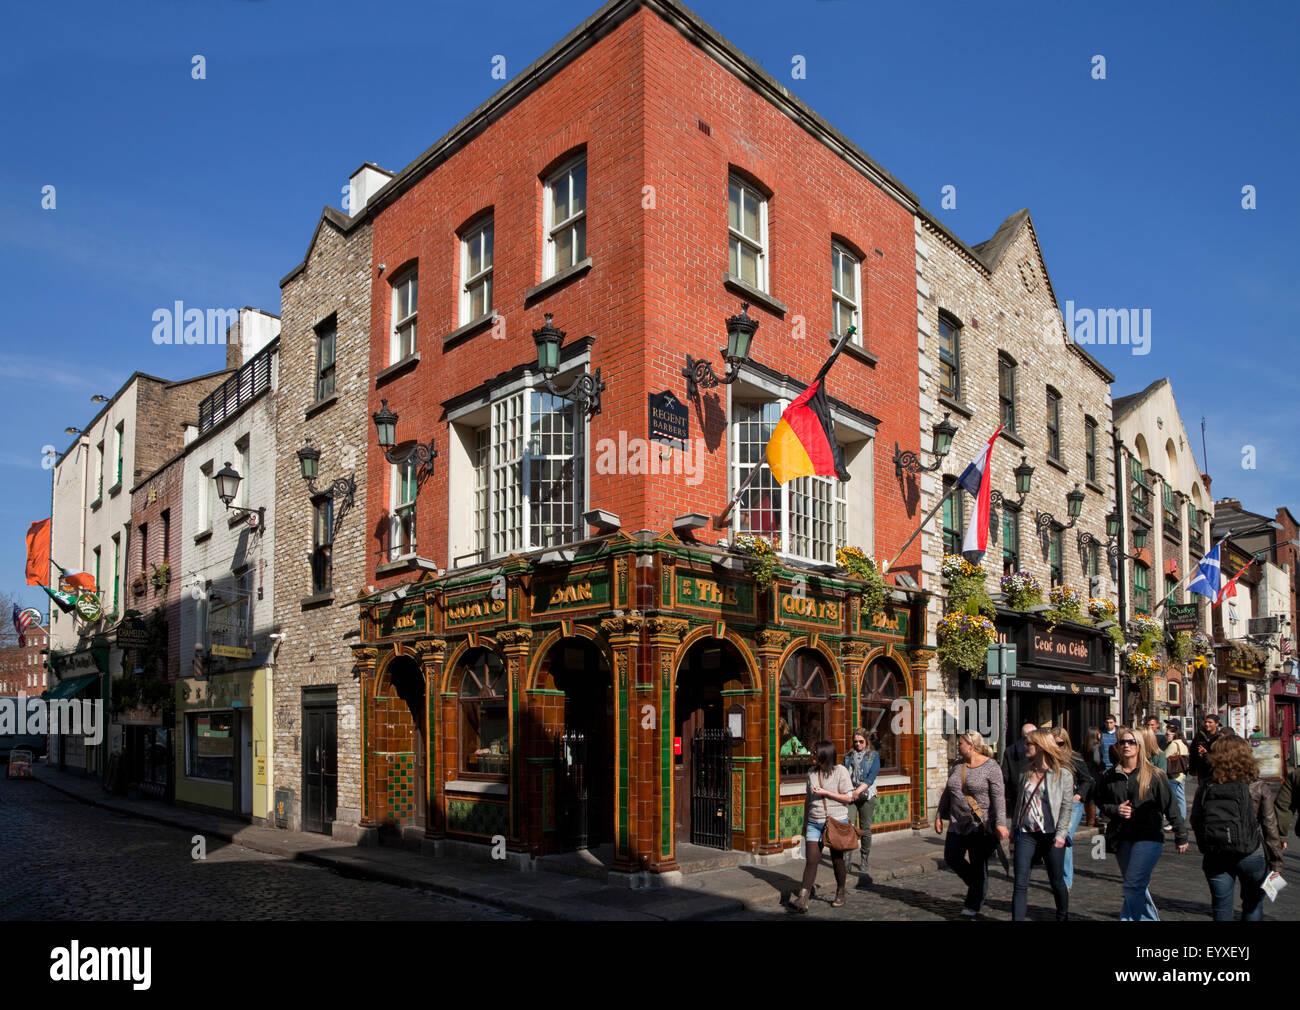 The Quays, Tiled Victorian Pub, Temple Bar, Dublin's cultural quarter, Dublin City, Ireland. - Stock Image